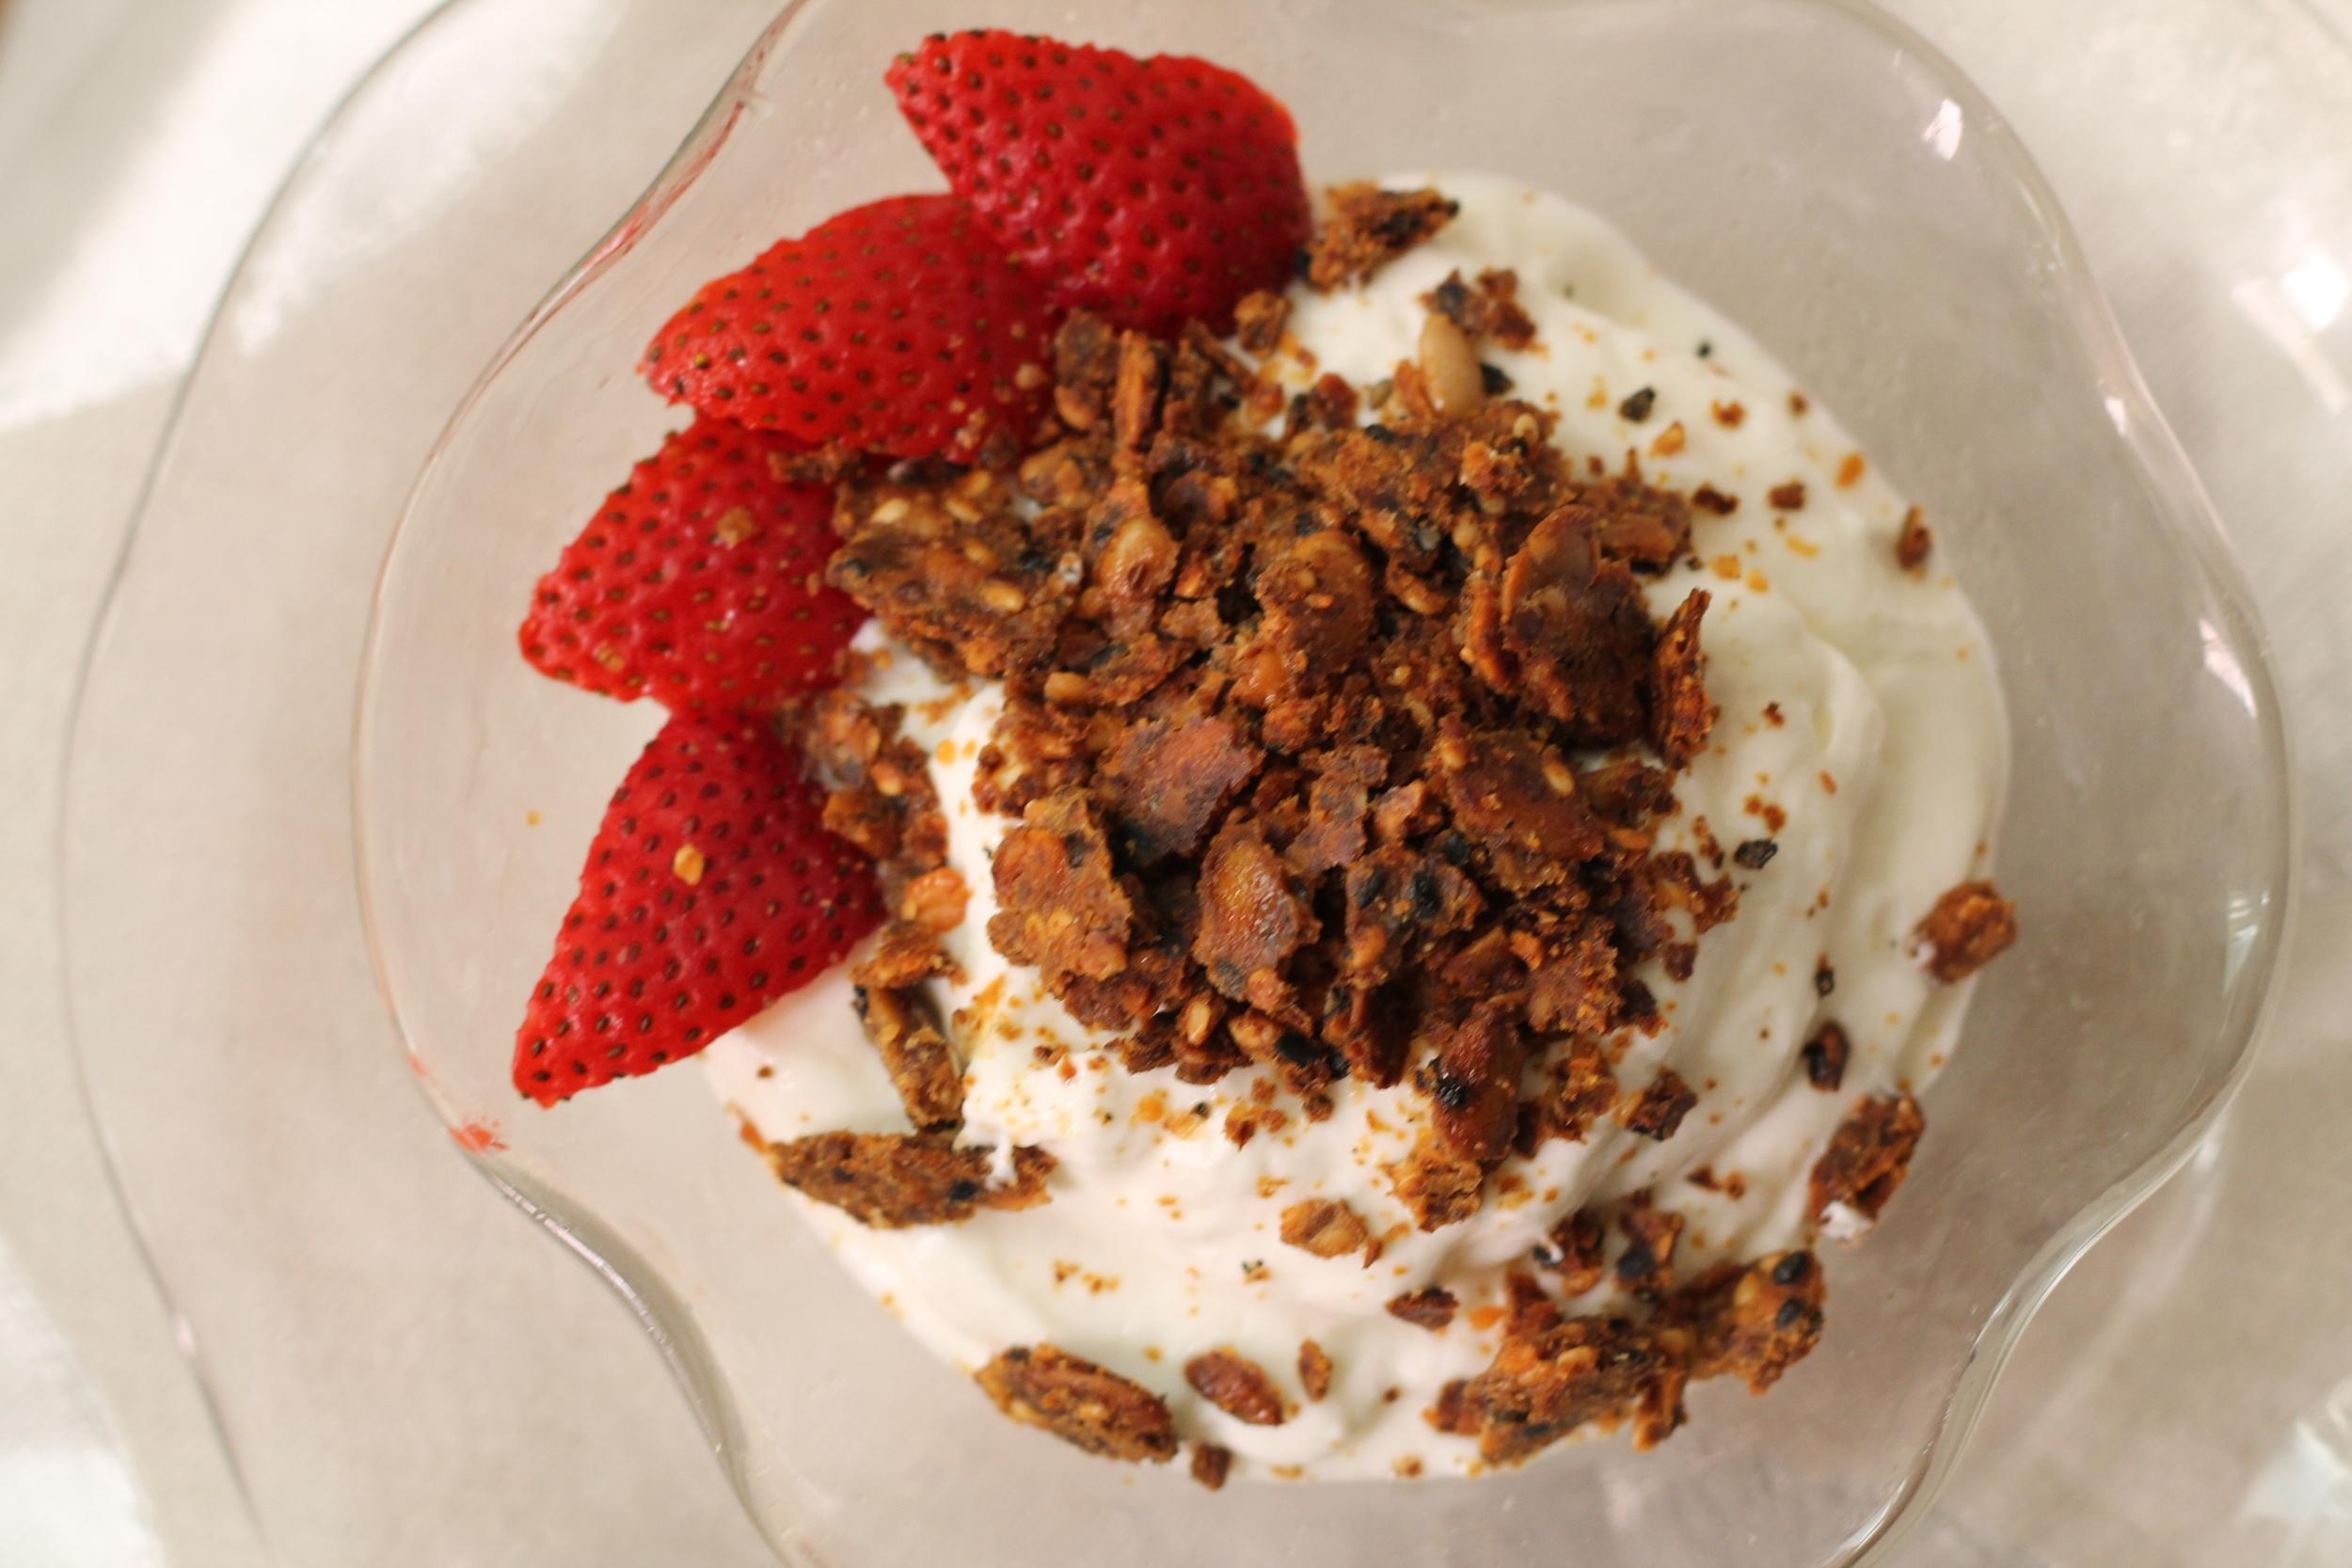 Crumbled Farmerbrowne's on Organic Goat's Milk Yogurt and Strawberries